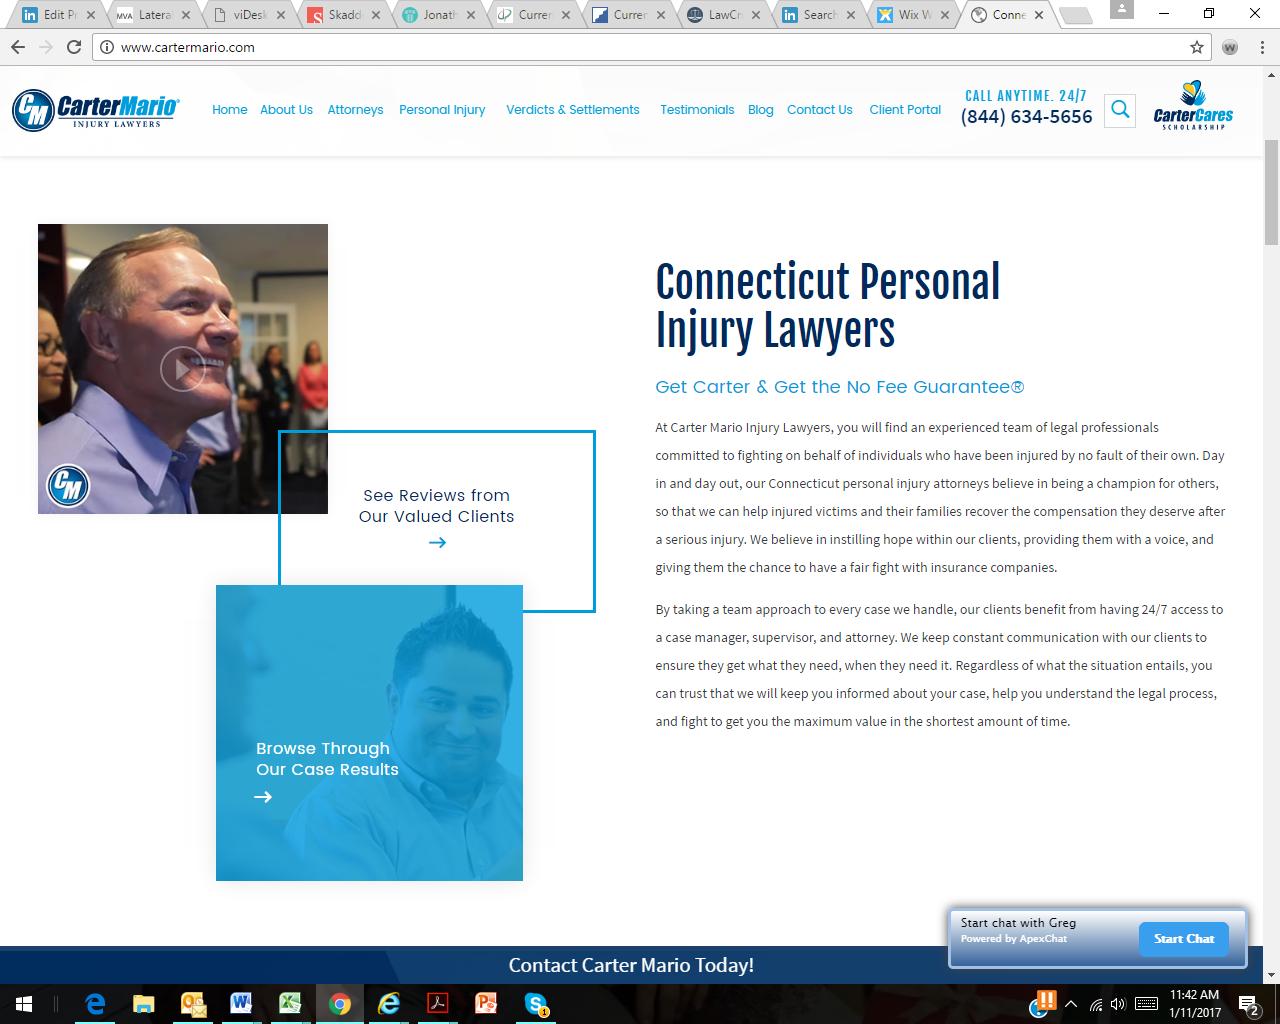 Carter Mario Injury Lawyers